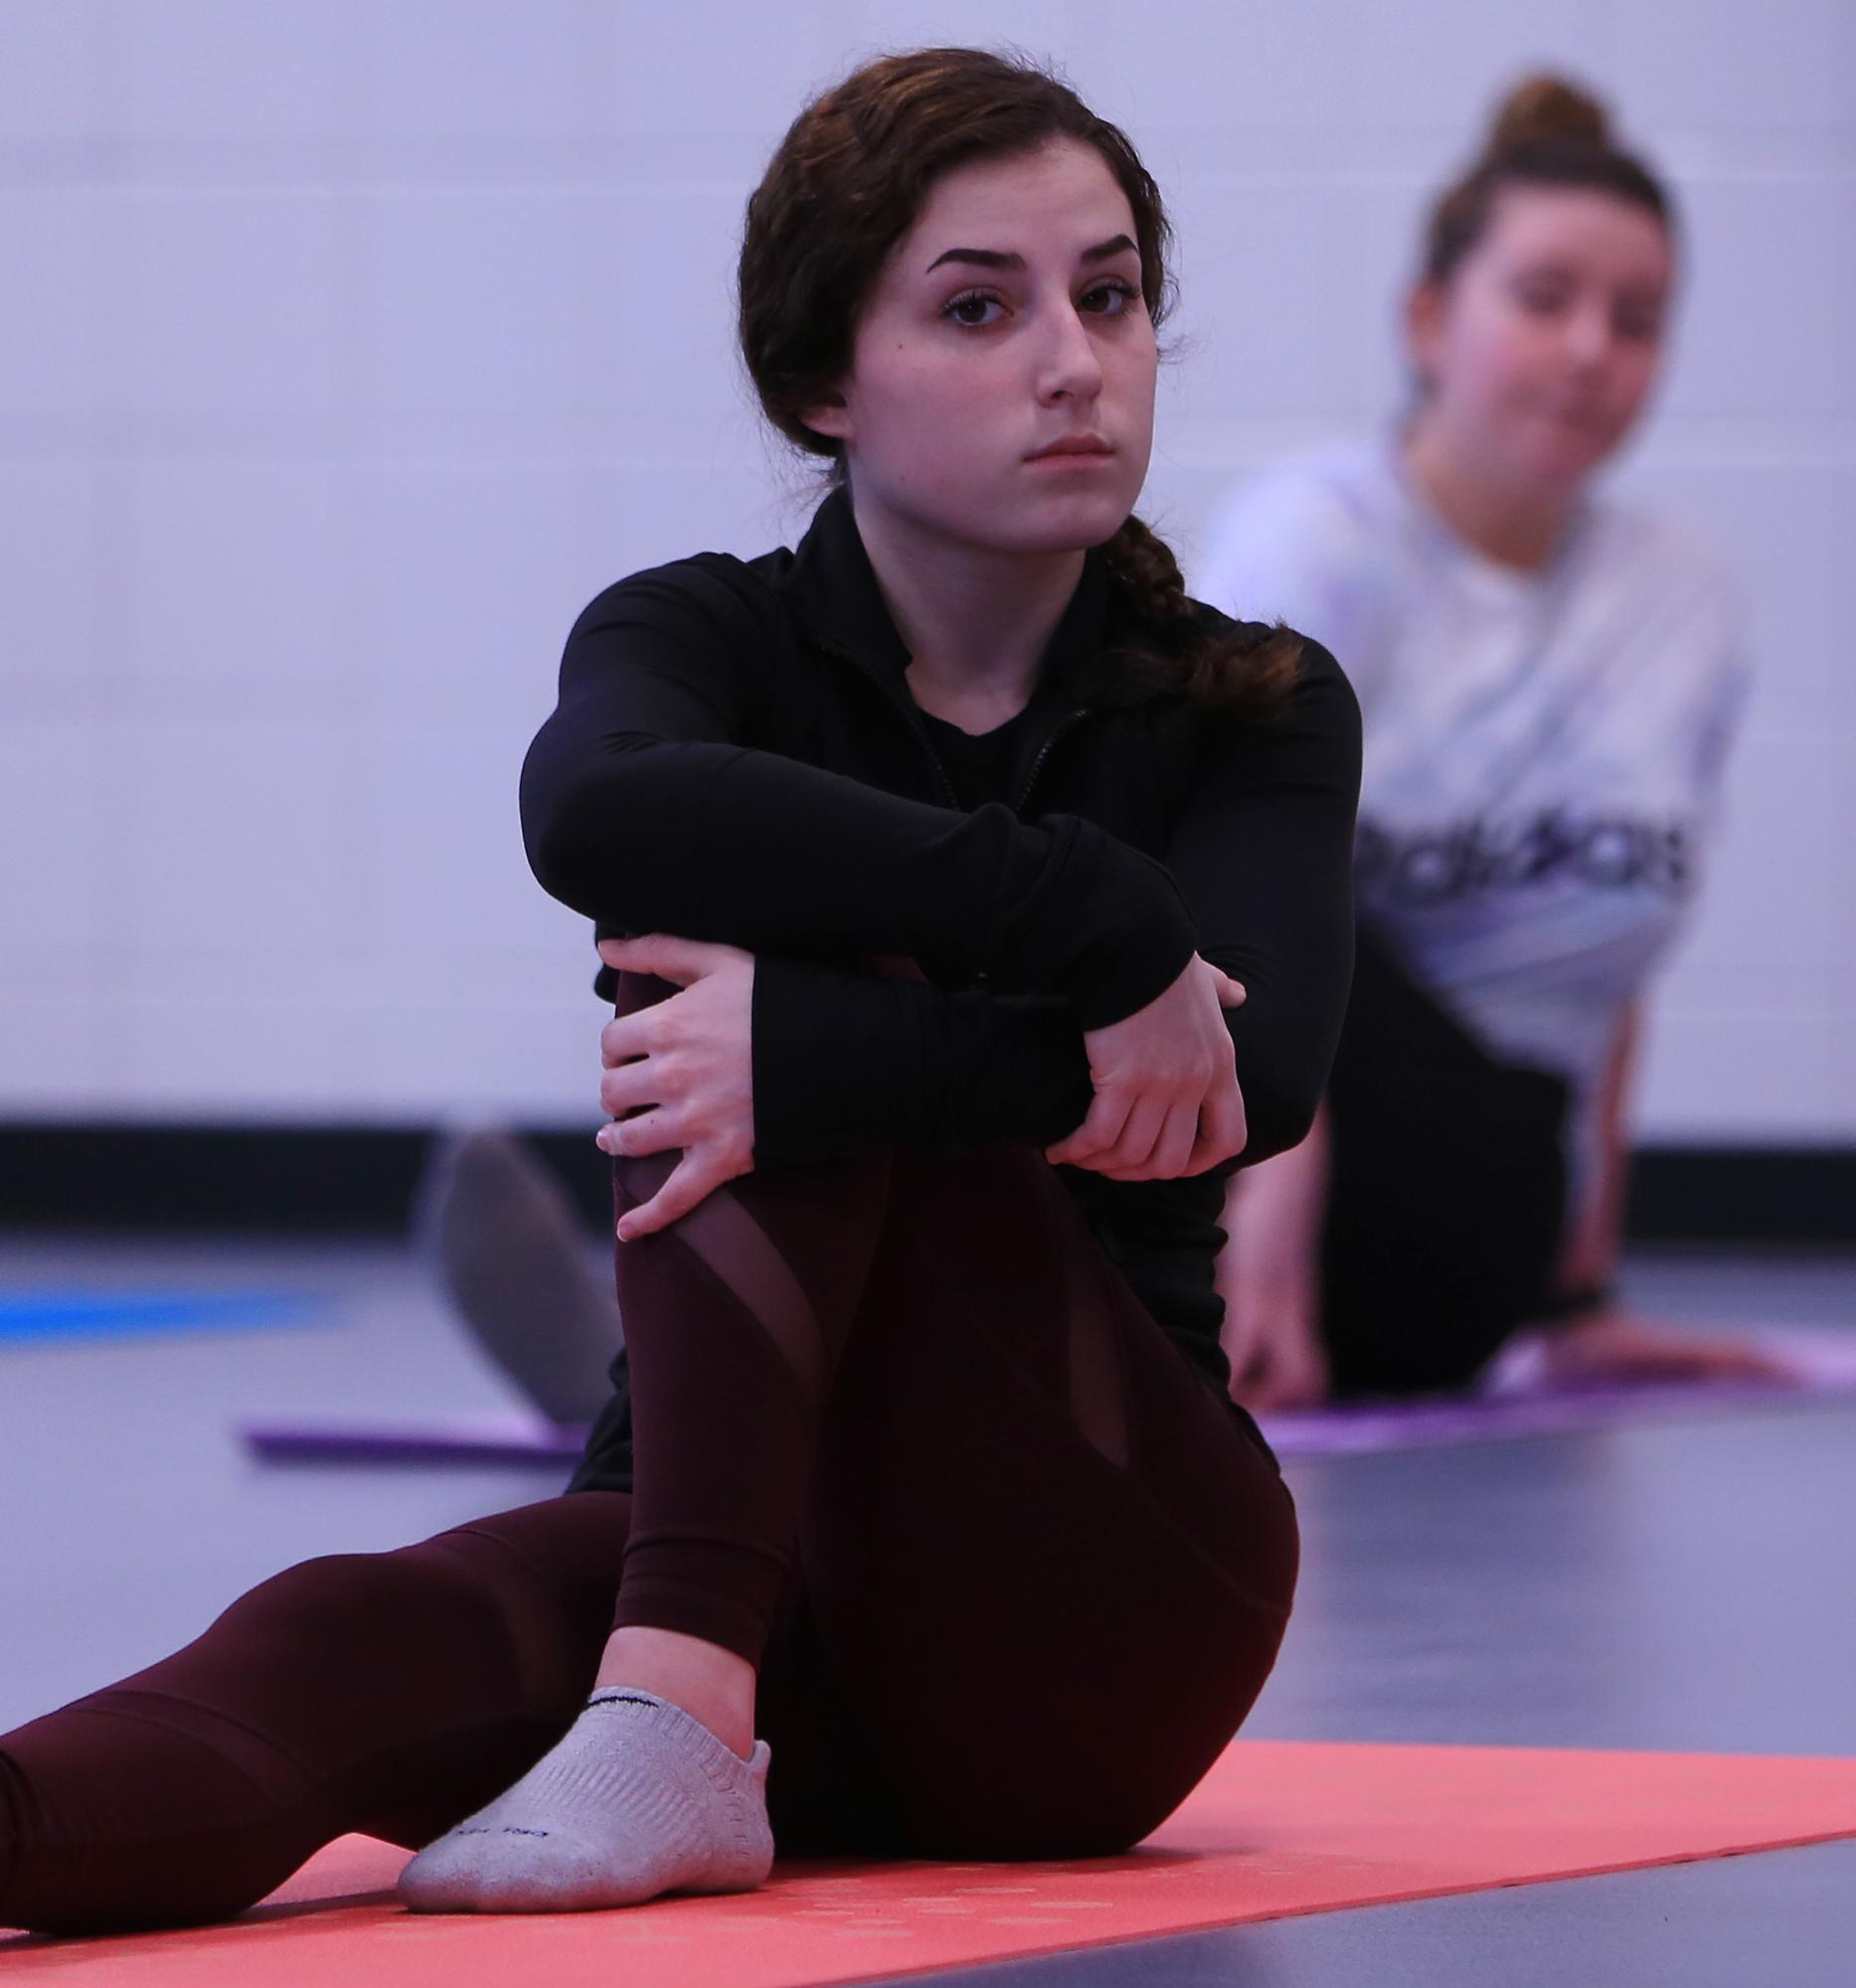 Yoga in Inver Studio